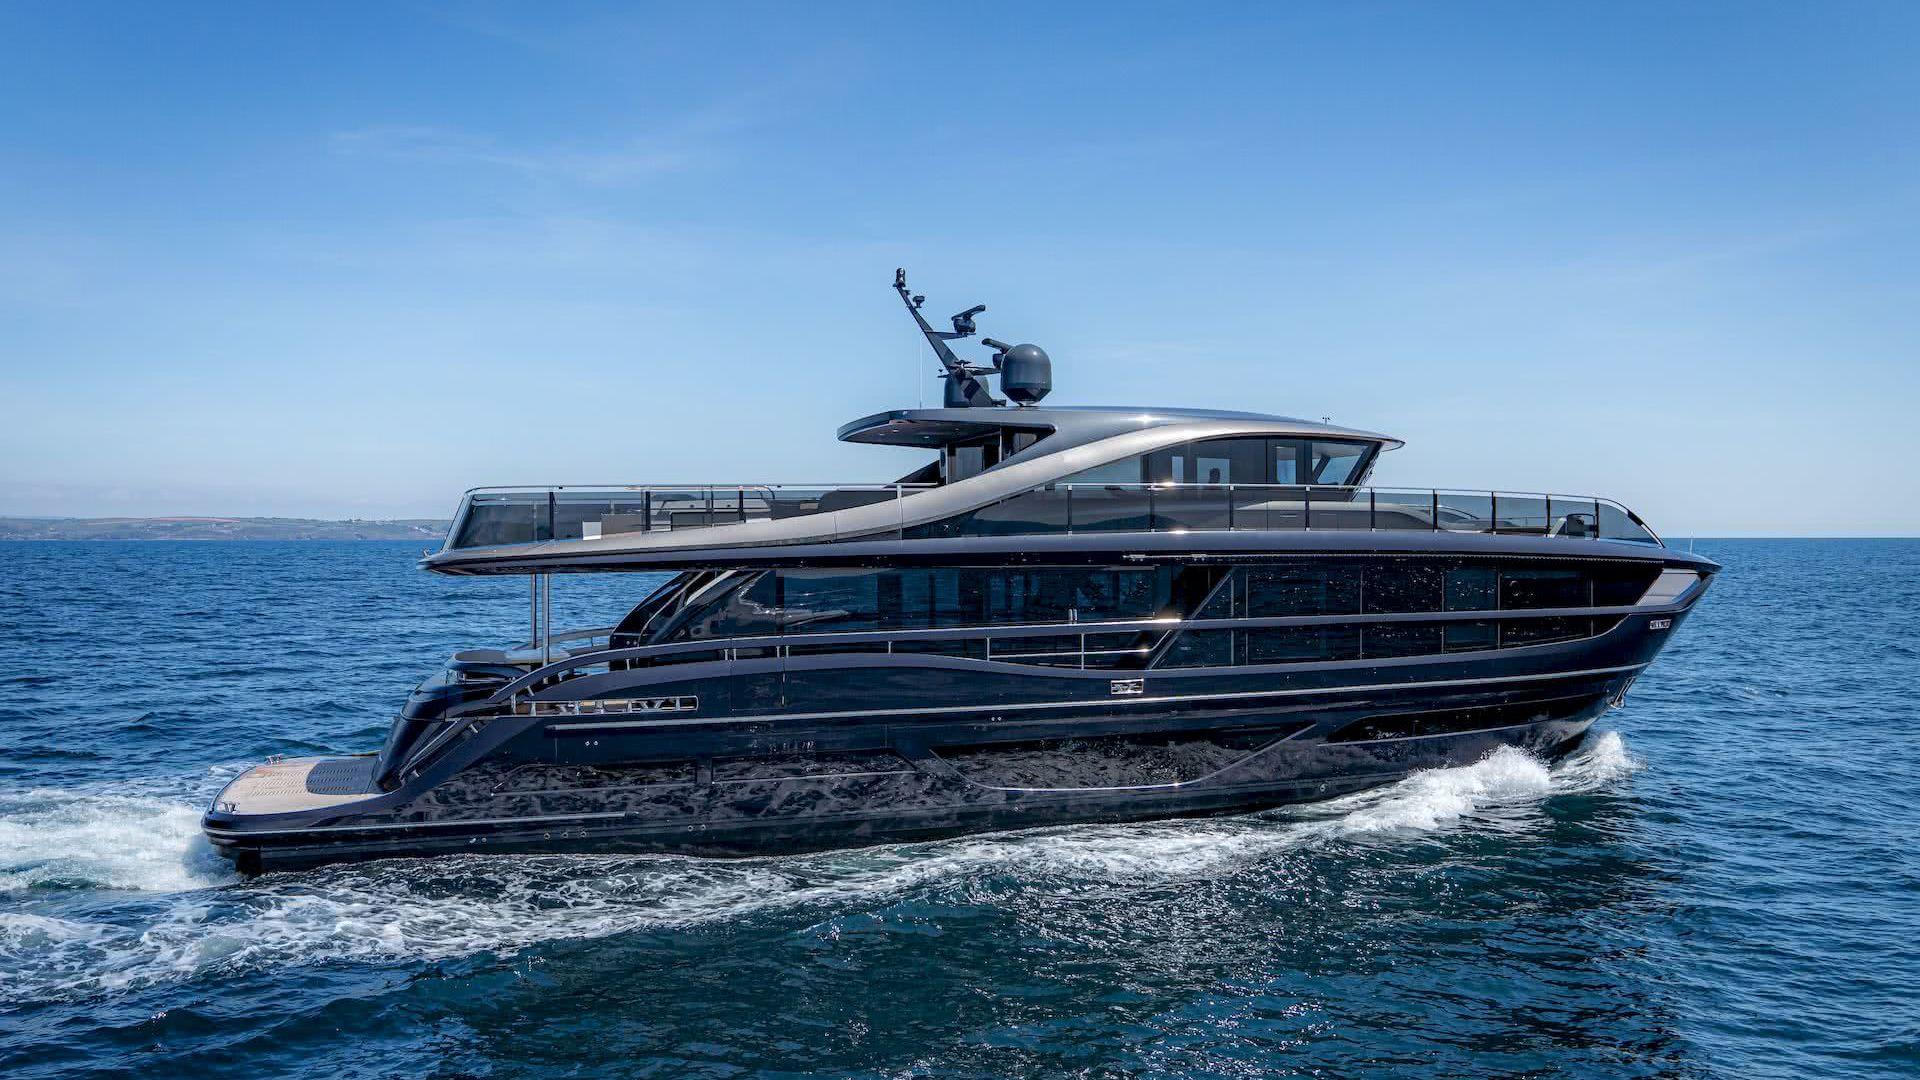 Princess X95 Yacht Olesinski Yacht Design Pininfarina